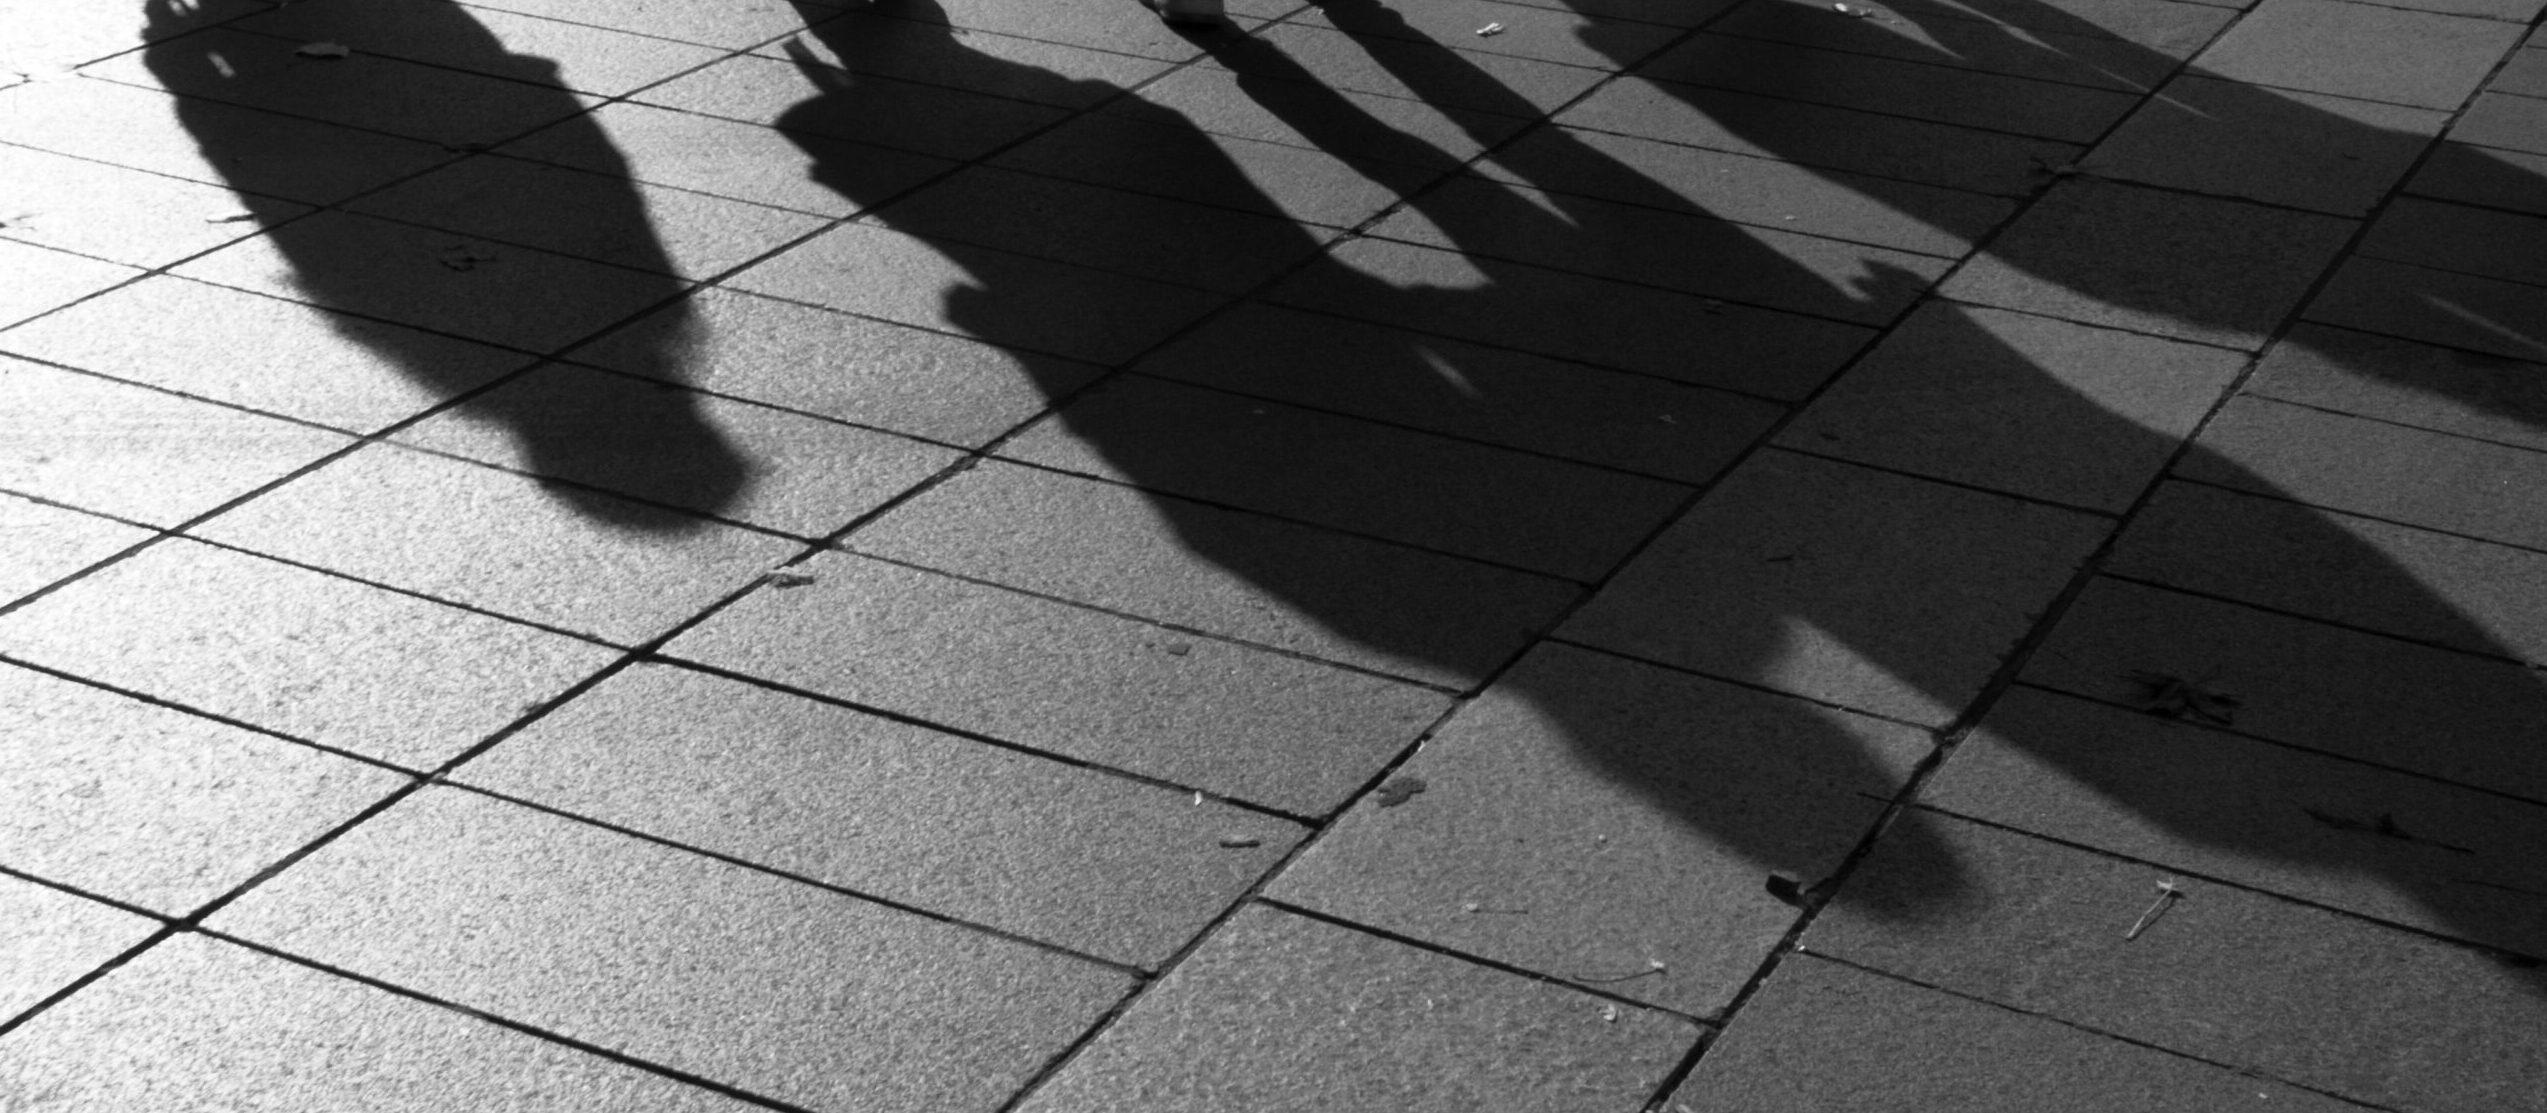 More shadow than light